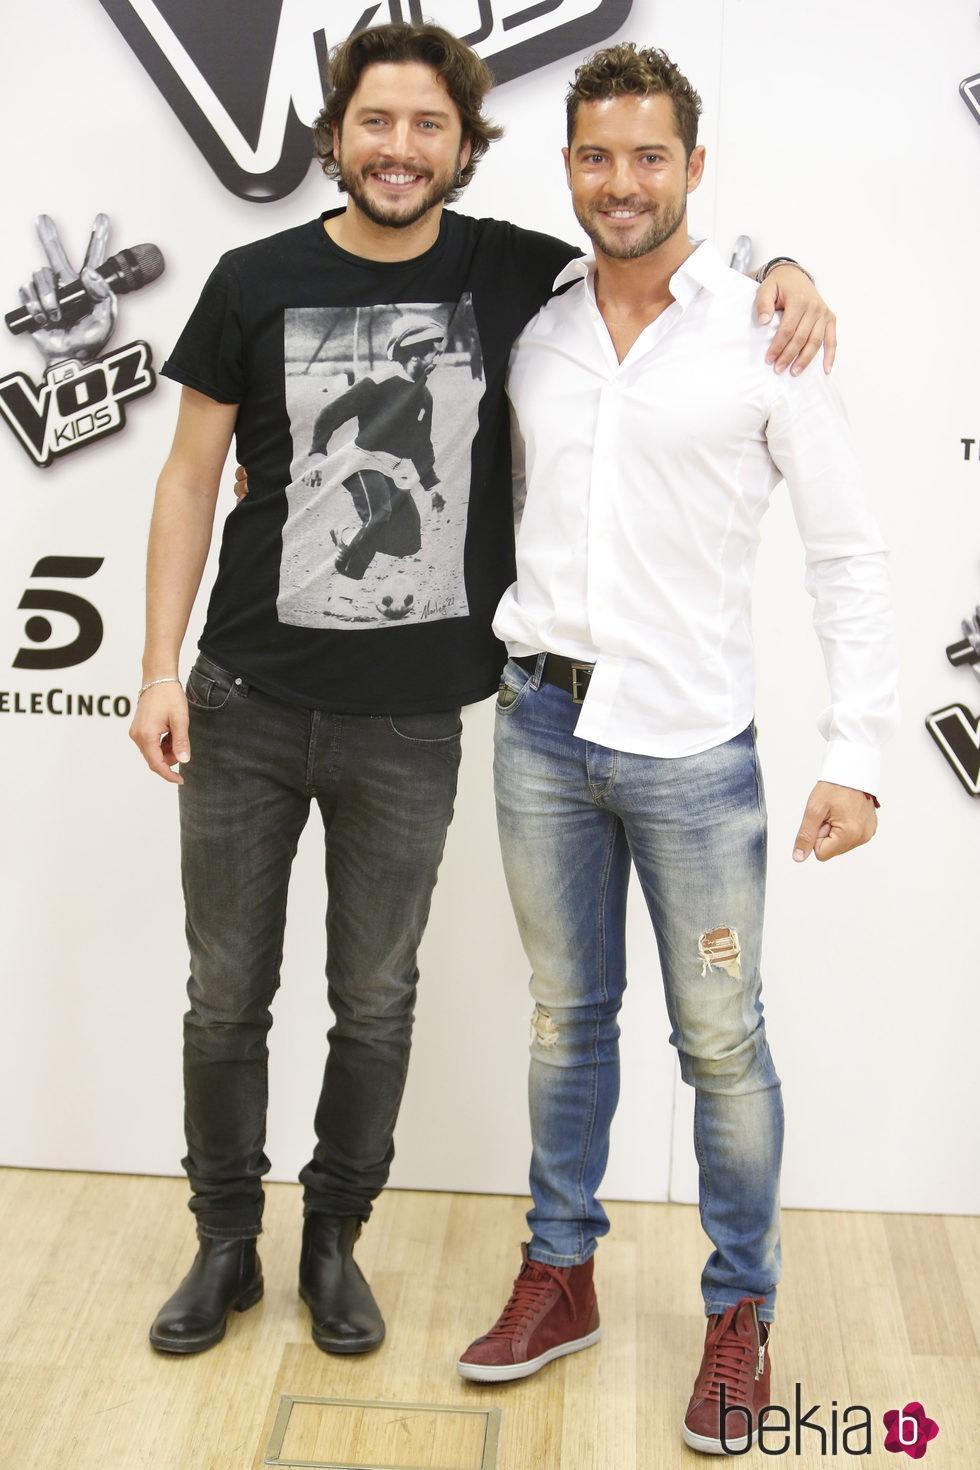 ¿Cuánto mide David Bisbal? - Altura real: 1,73 - Real height 78588_manuel-carrasco-david-bisbal-presentacion-la-voz-kids-2